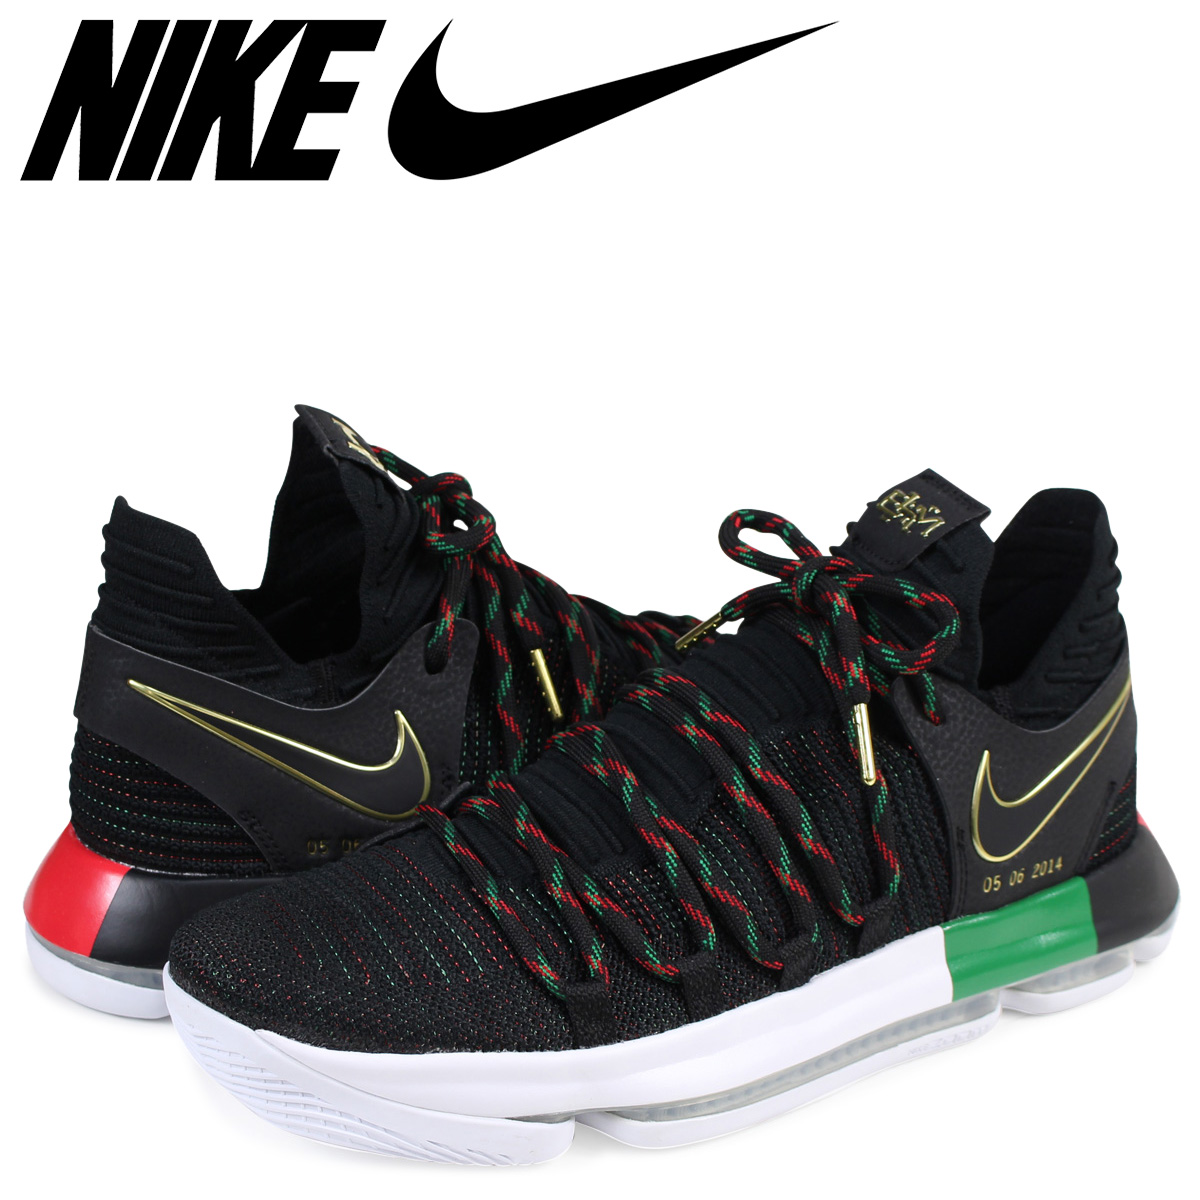 wholesale dealer 5330a 75205 NIKE Nike KD10 sneakers men ZOOM KD 10 LMTD EP BHM AA4197-003 Kevin Durant  black black